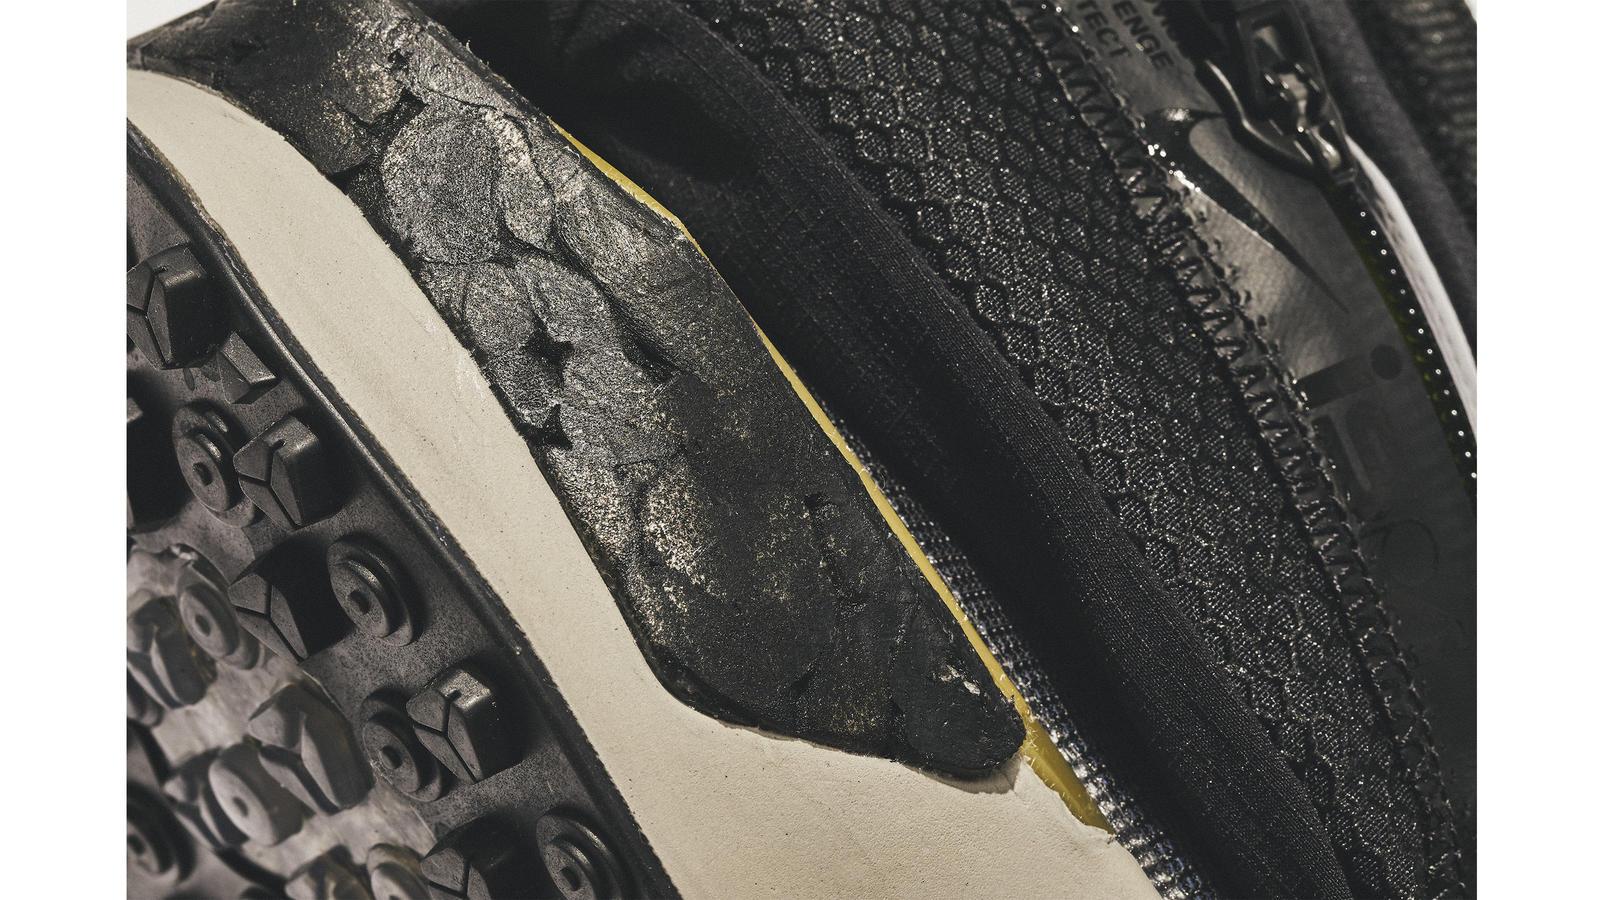 Nike ISPA Drifter Gator 2